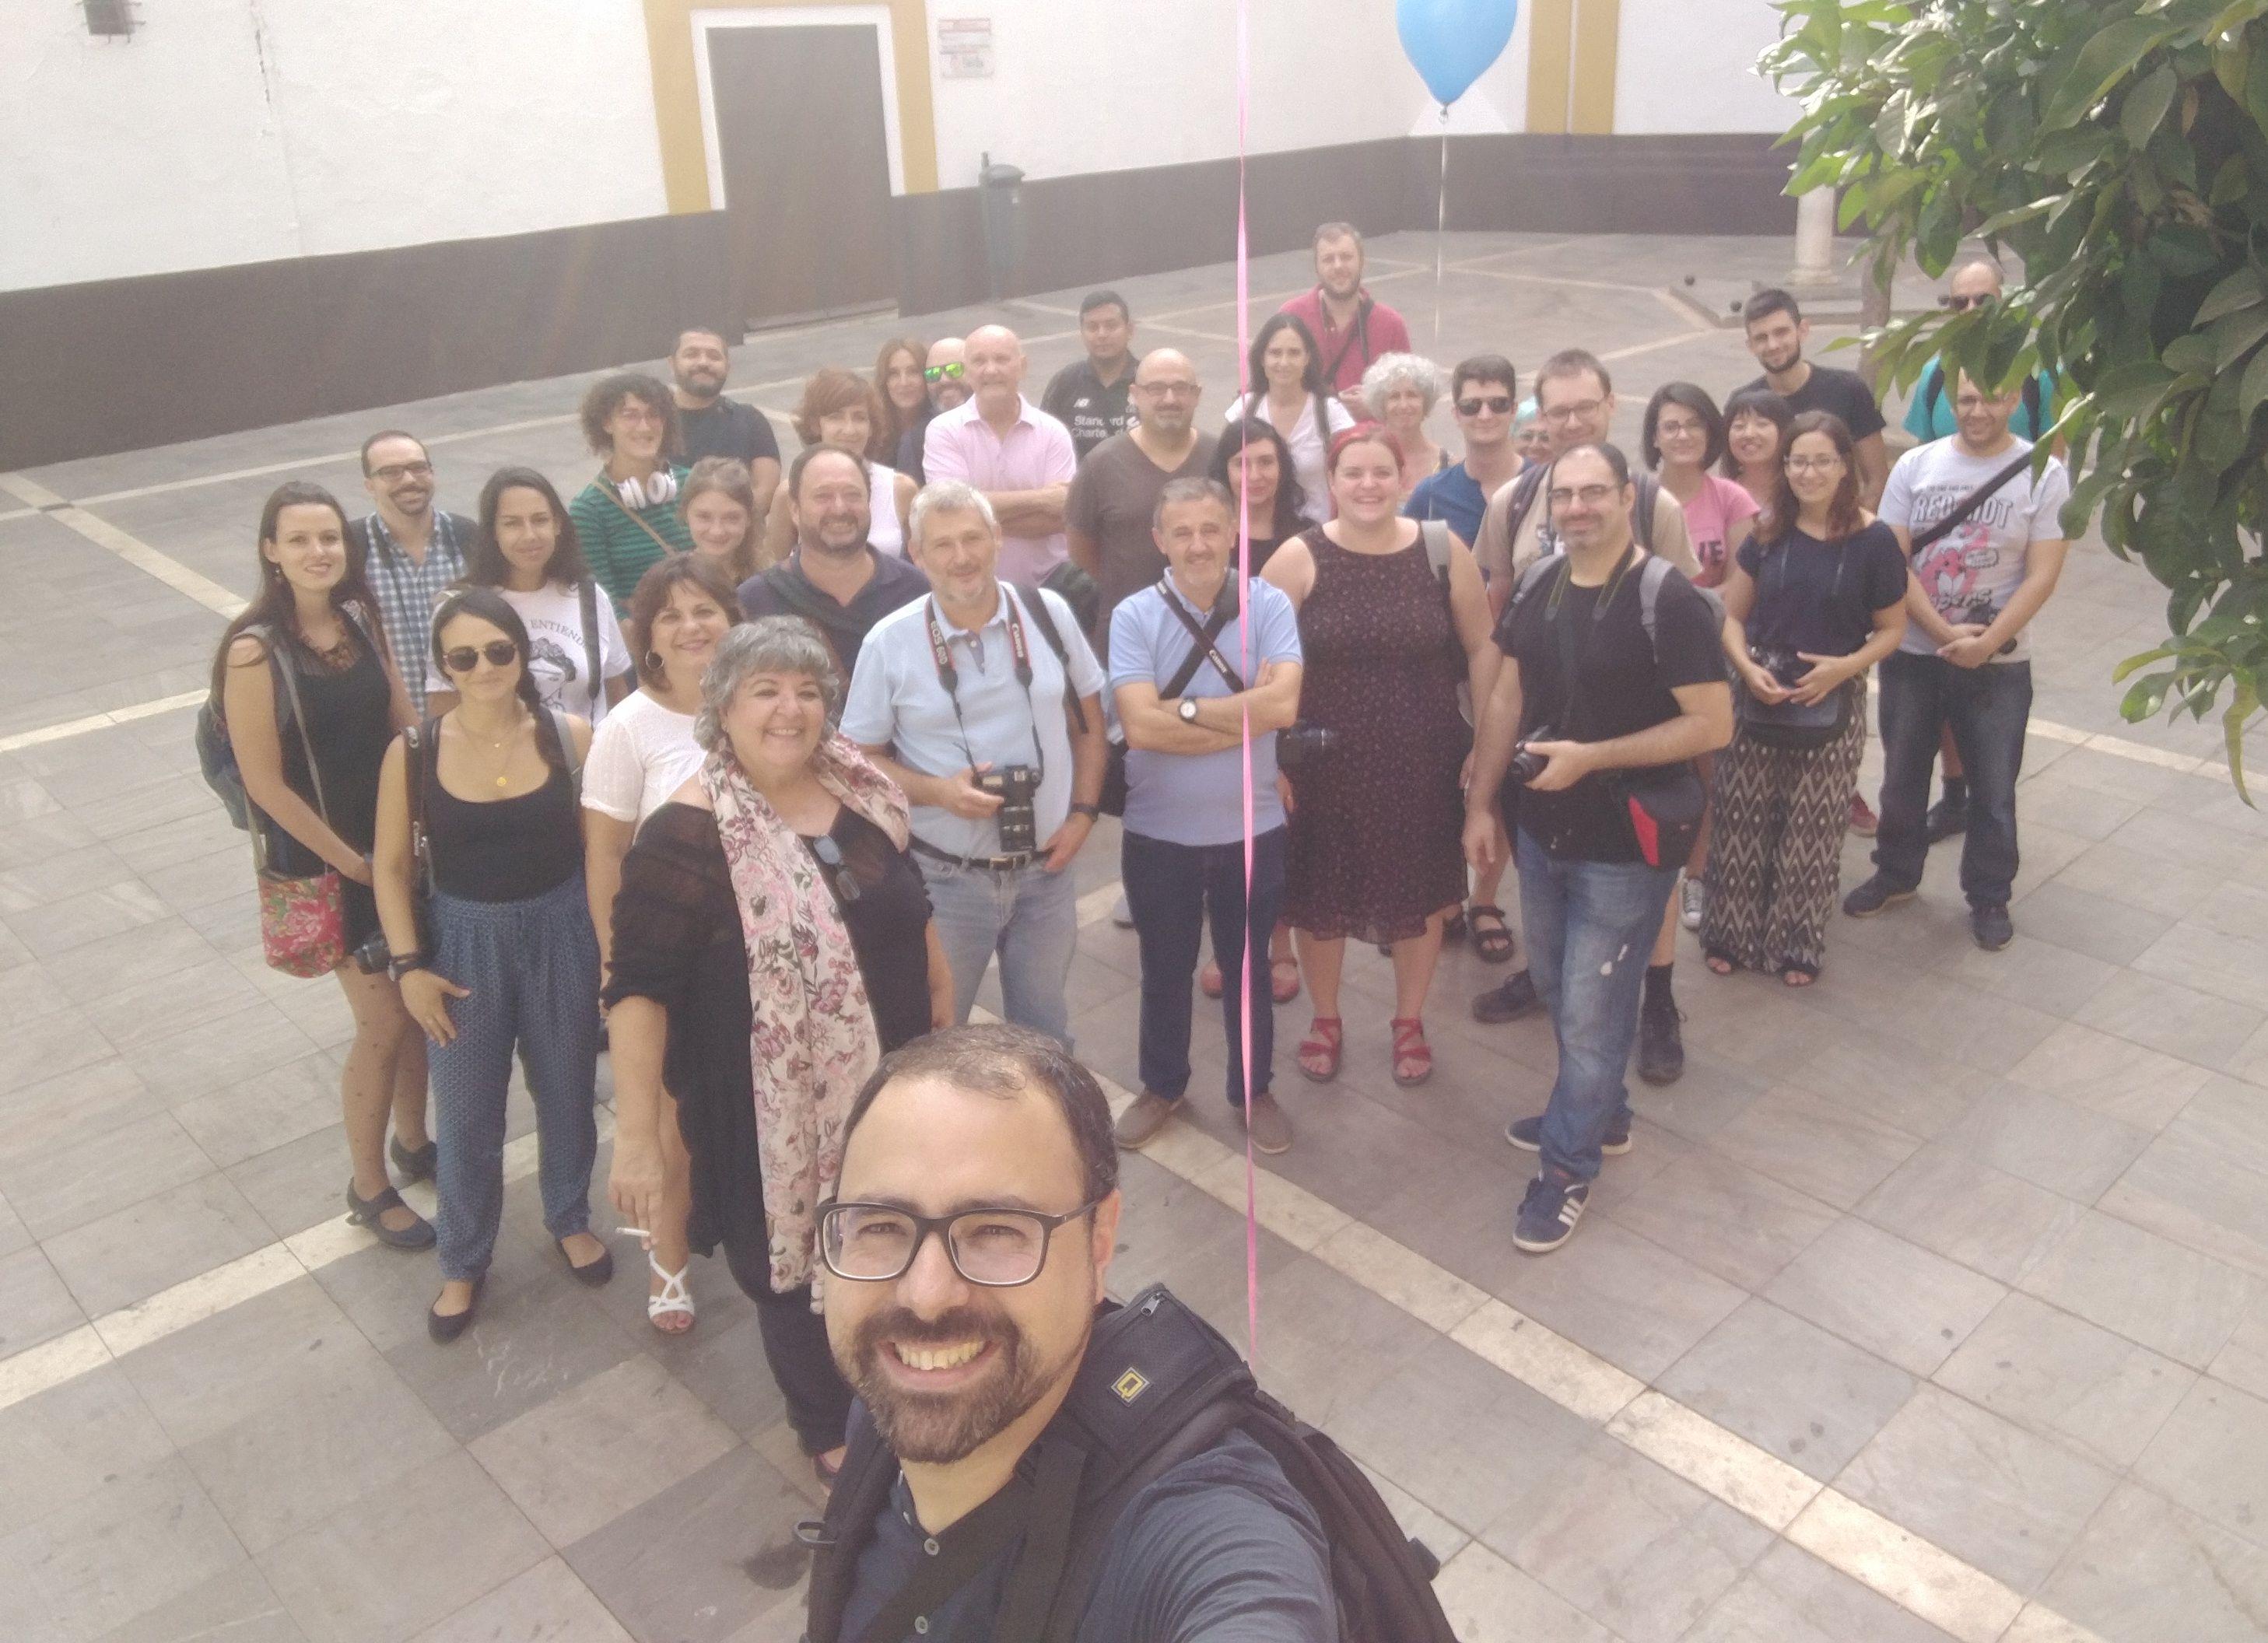 Sevilla Photowalks | Fotografía en grupo por Sevilla